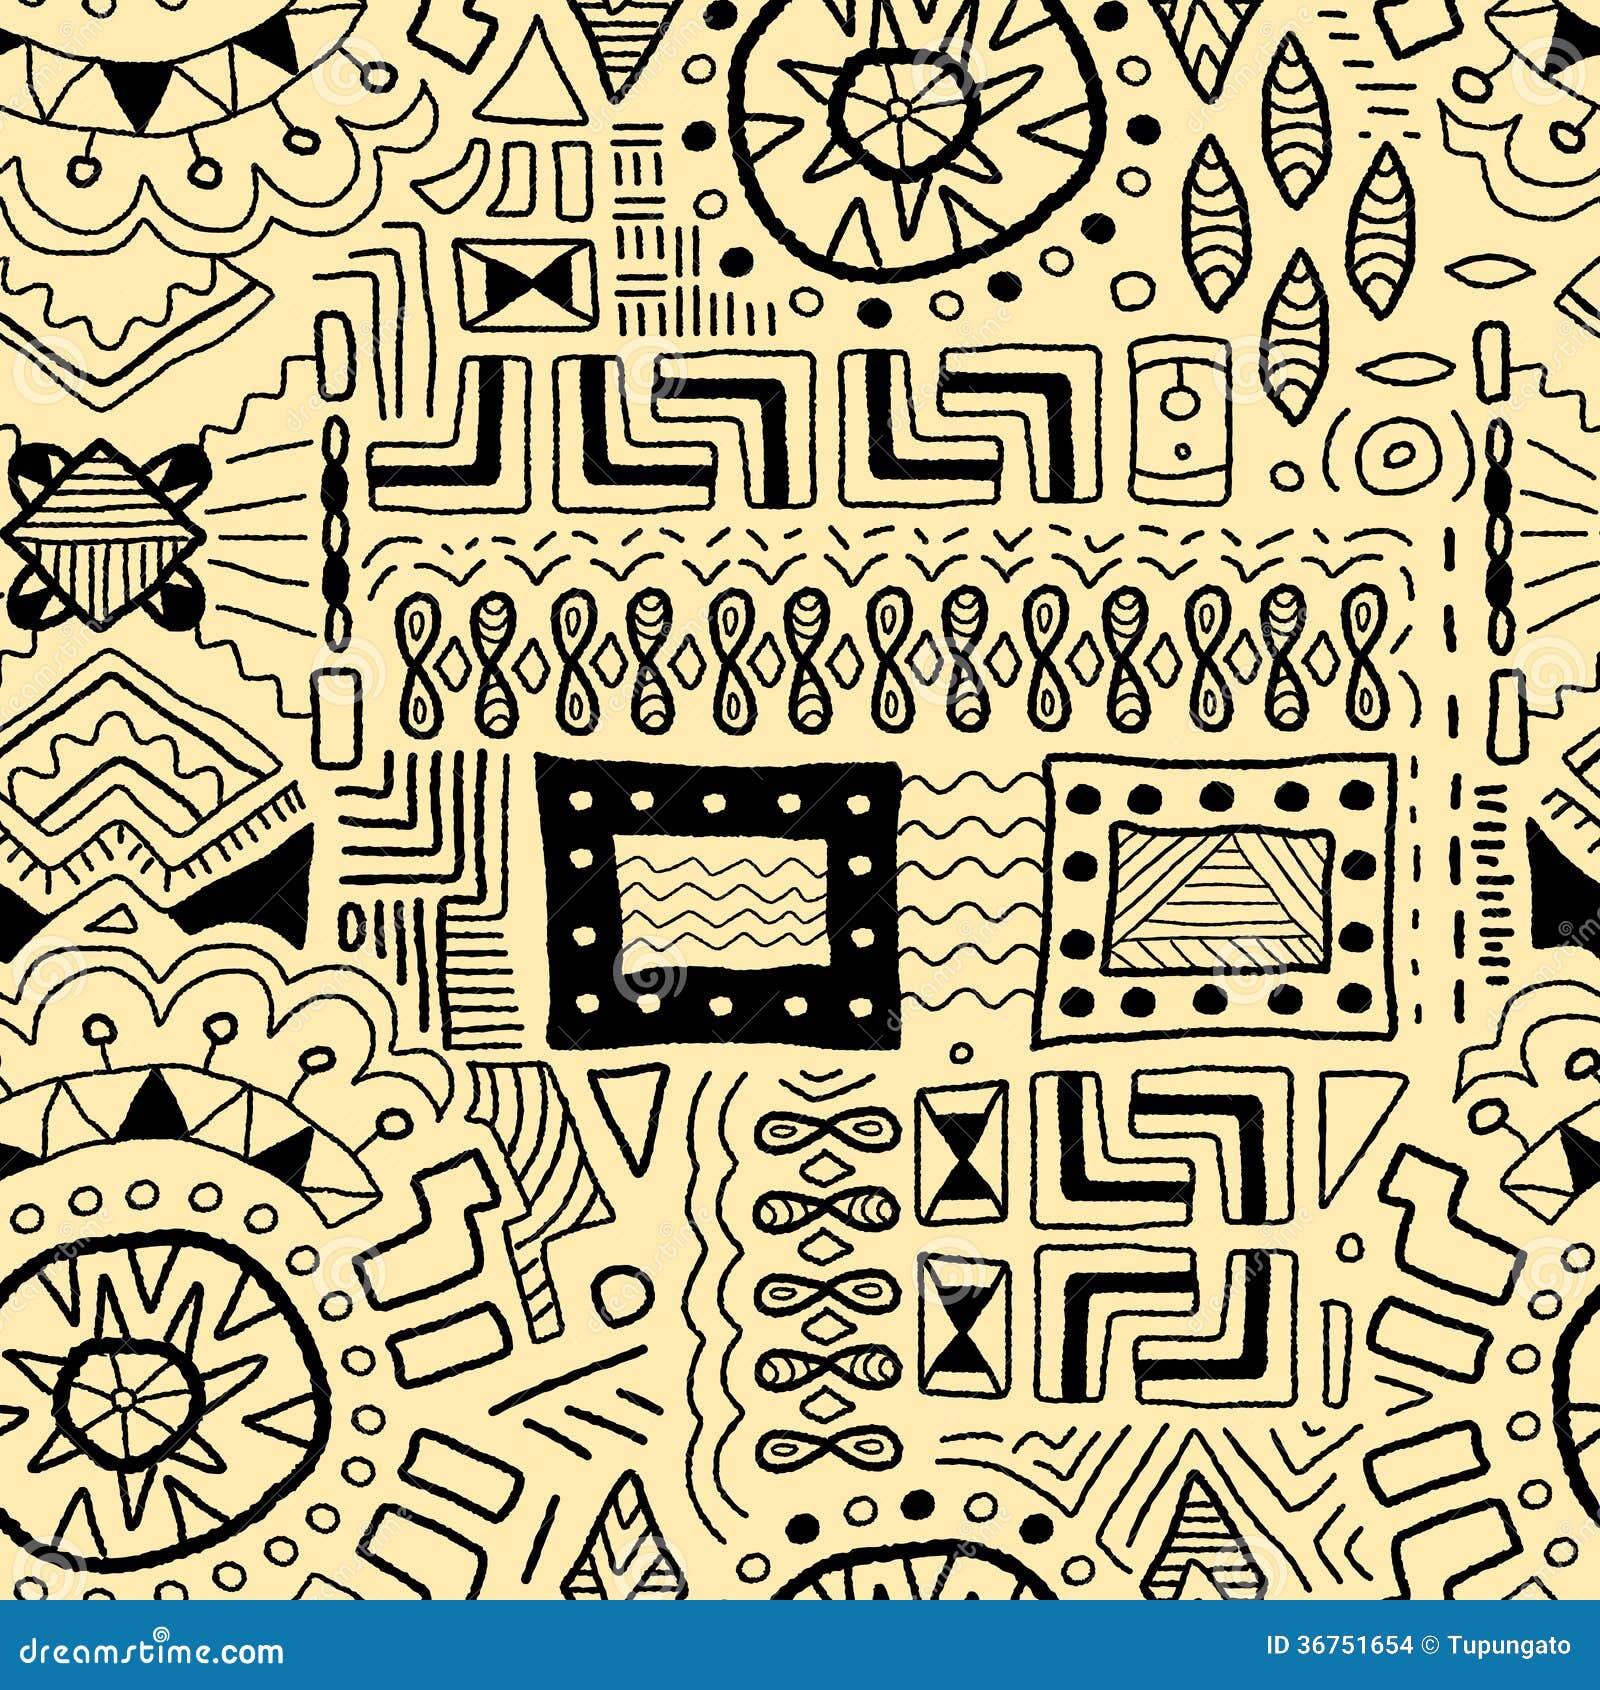 Aboriginal patterns stock vector. Illustration of traditional - 25567849